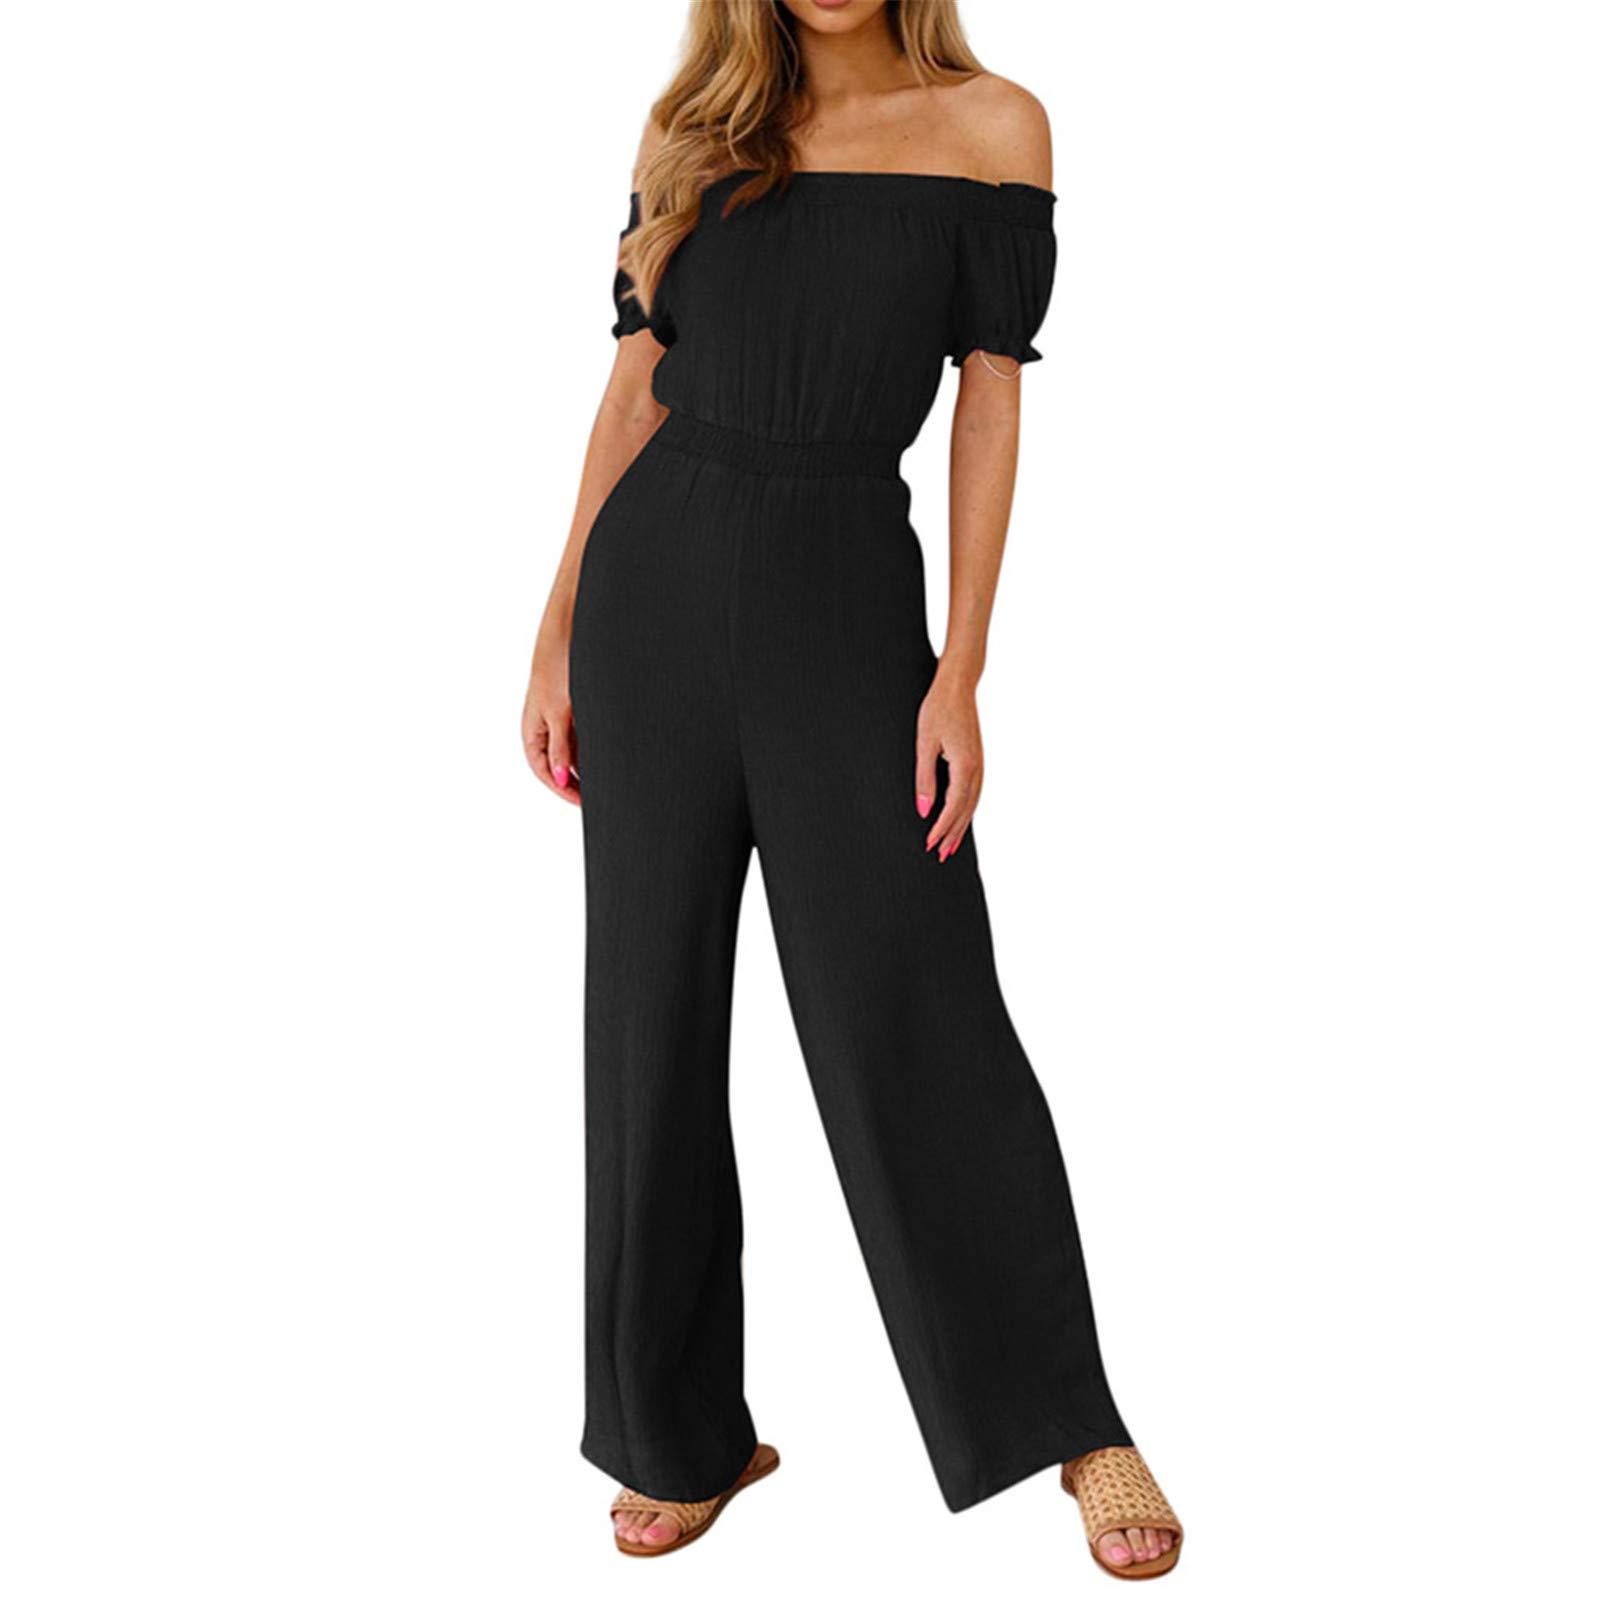 Thenxin Women Off Shoulder High Waist Jumpsuit Ruched Ruffle Trim Short Sleeve Wide Leg Long Romper(Black,L)